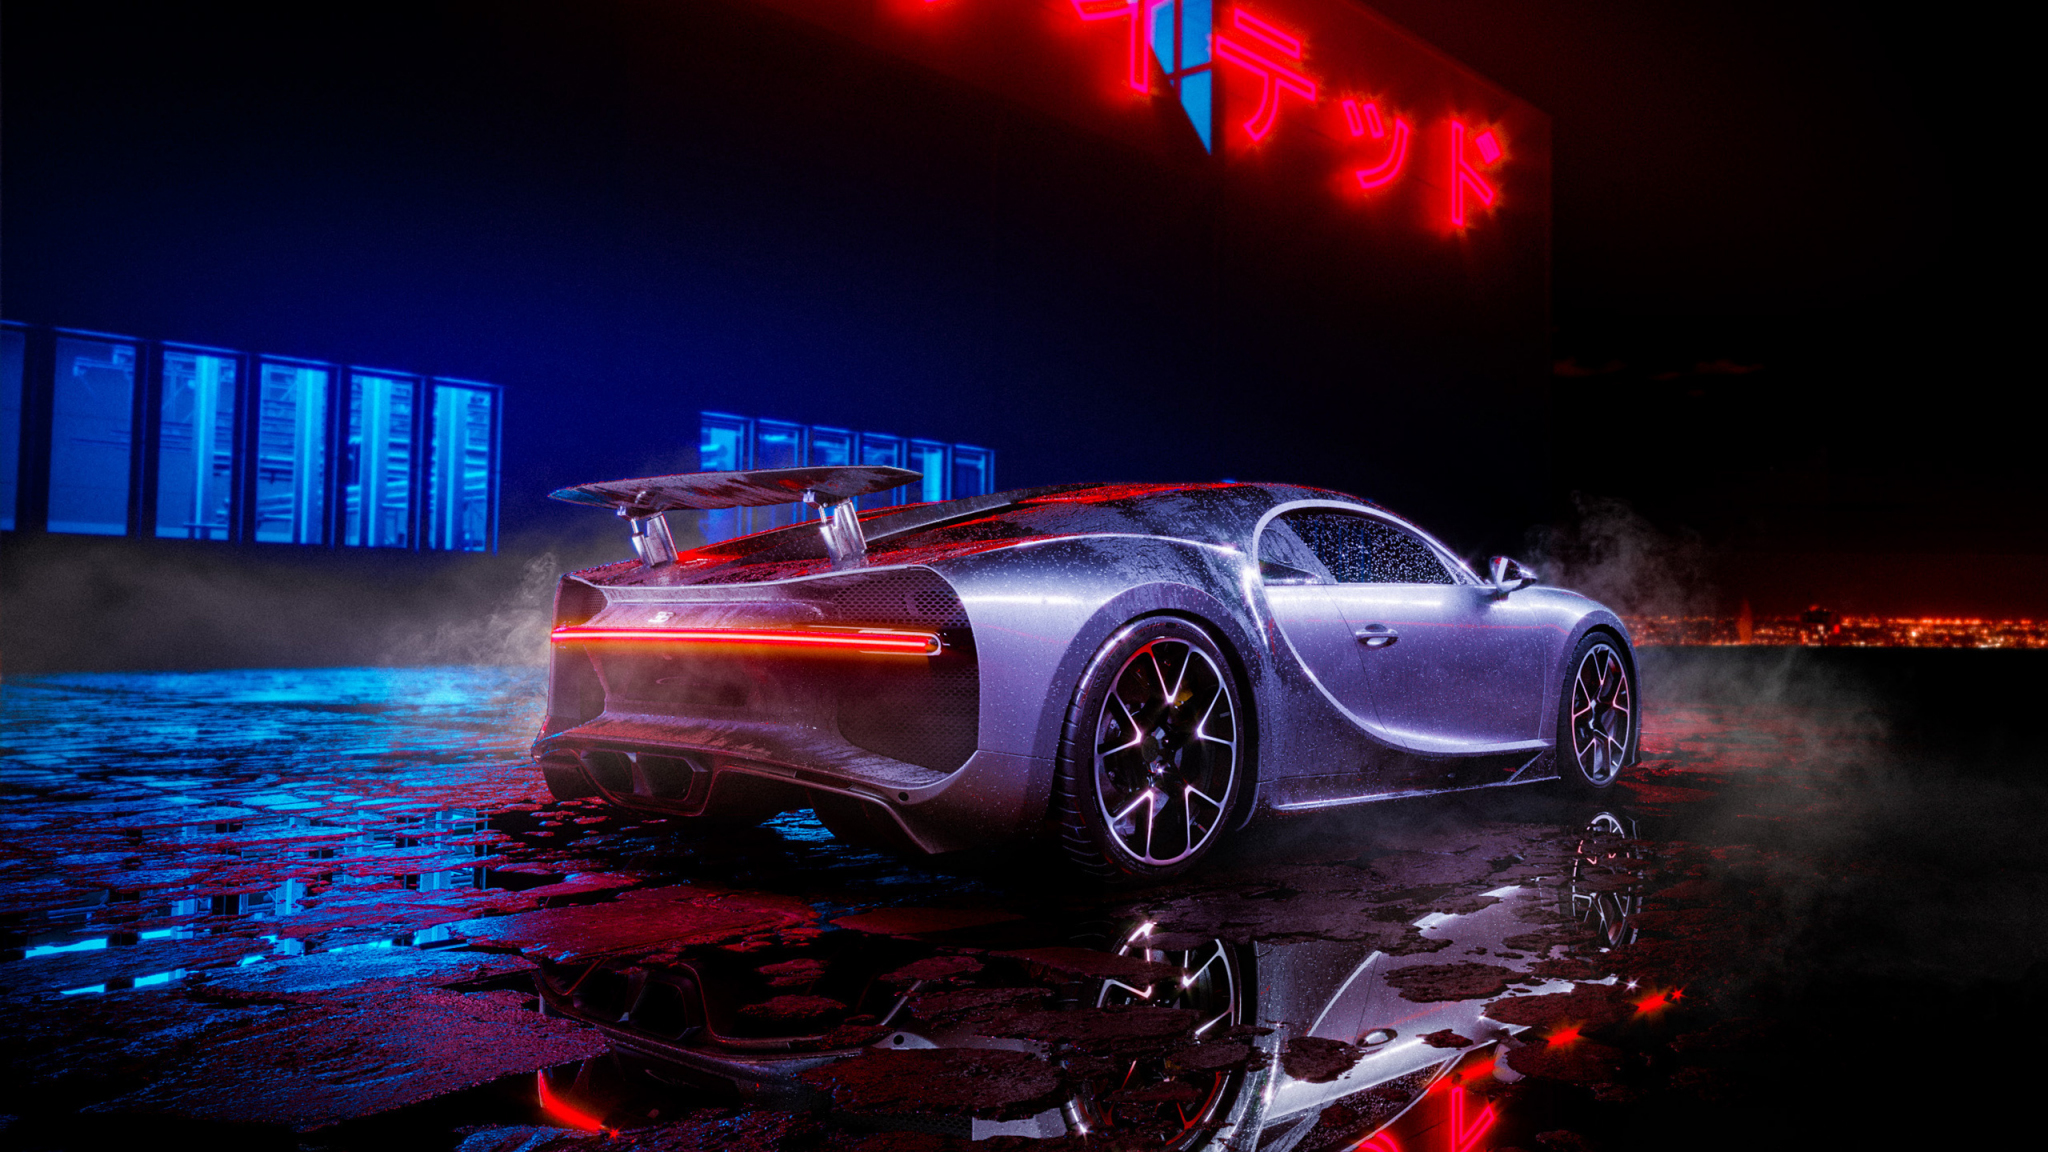 Download 2048x1152 Wallpaper Bugatti Chiron Neon Lights